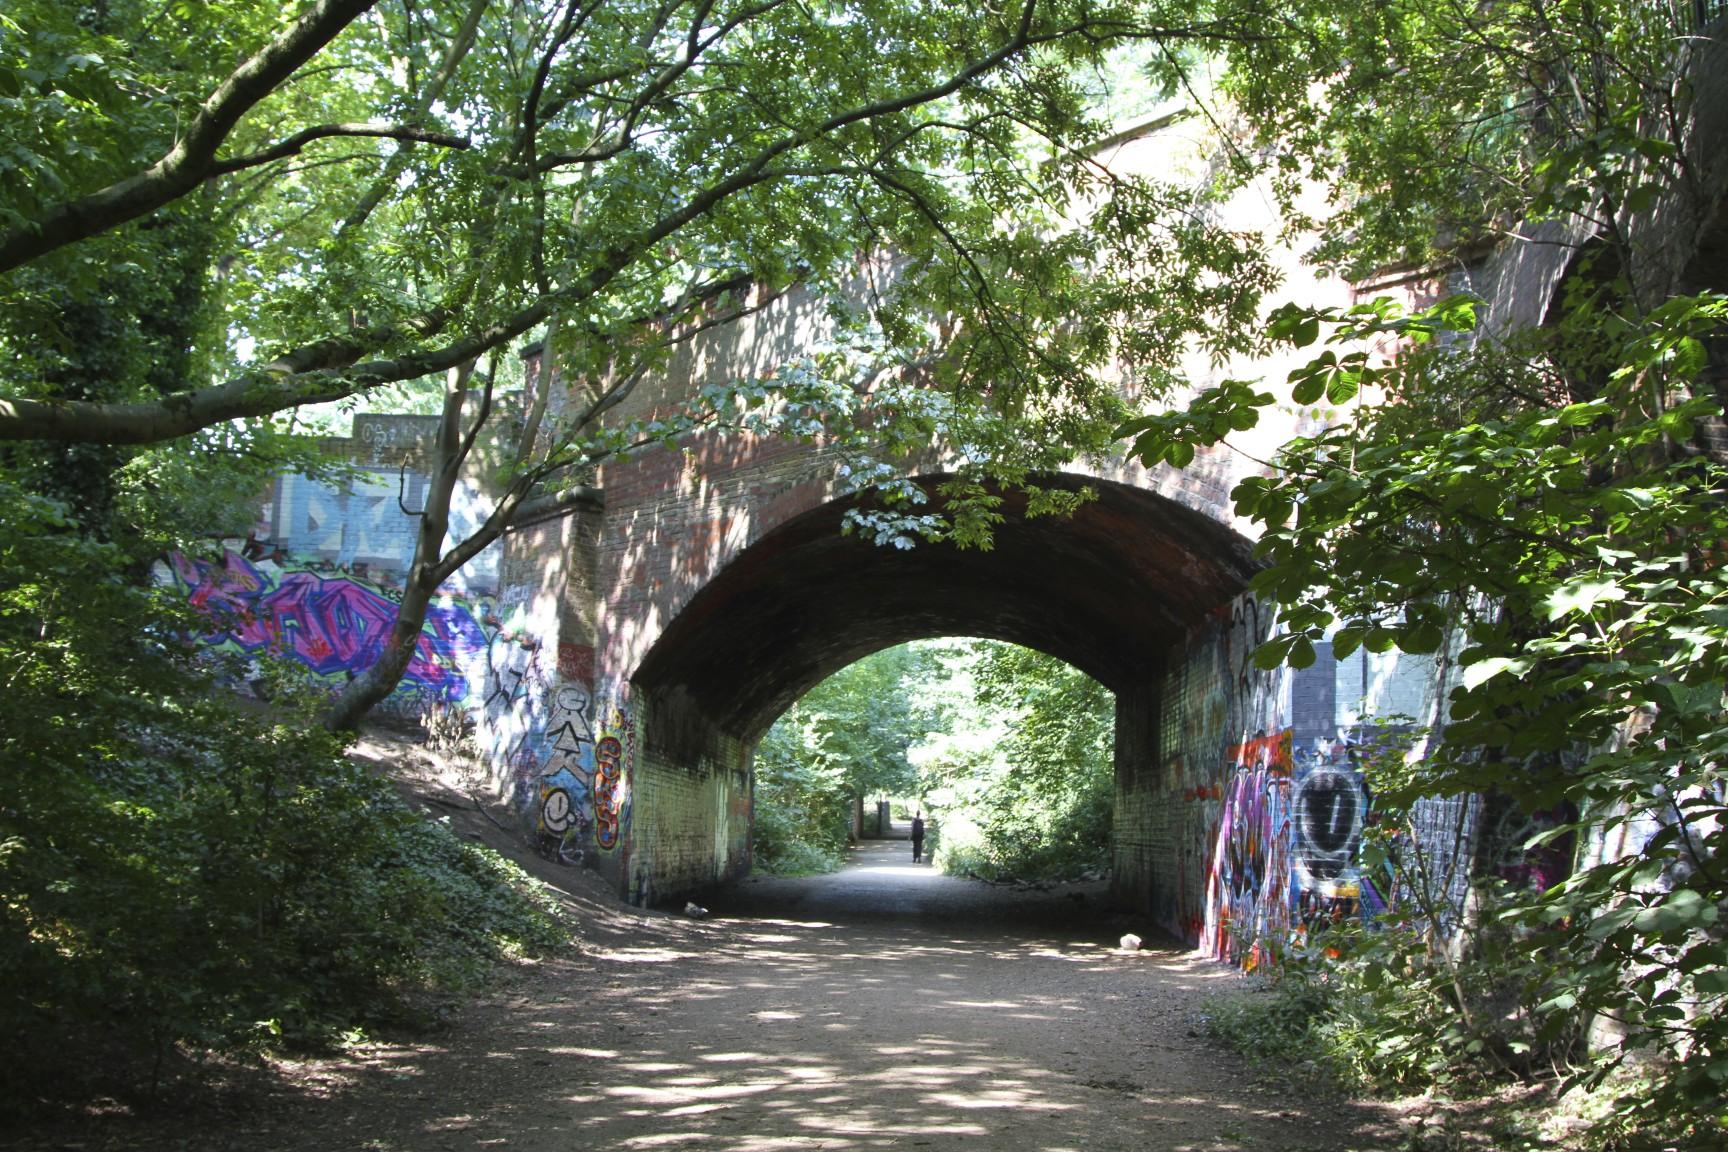 finsbury park - photo #42